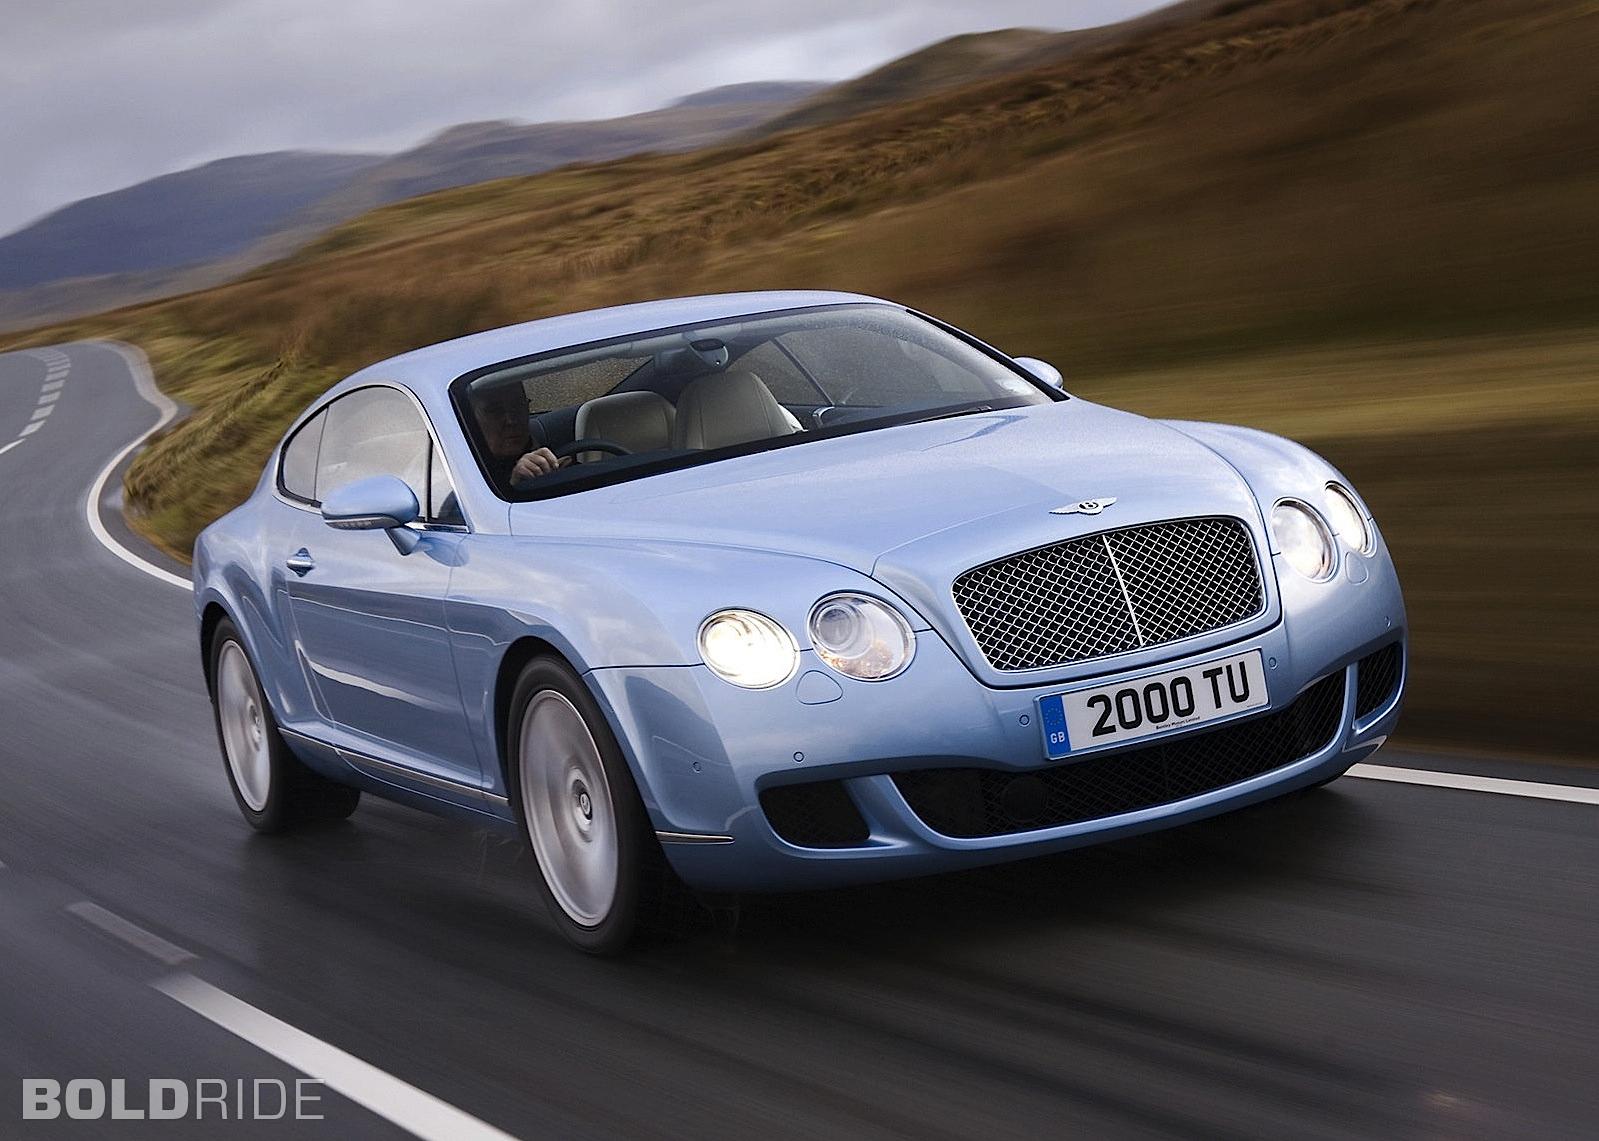 2009 Bentley Continental Gt Image 7